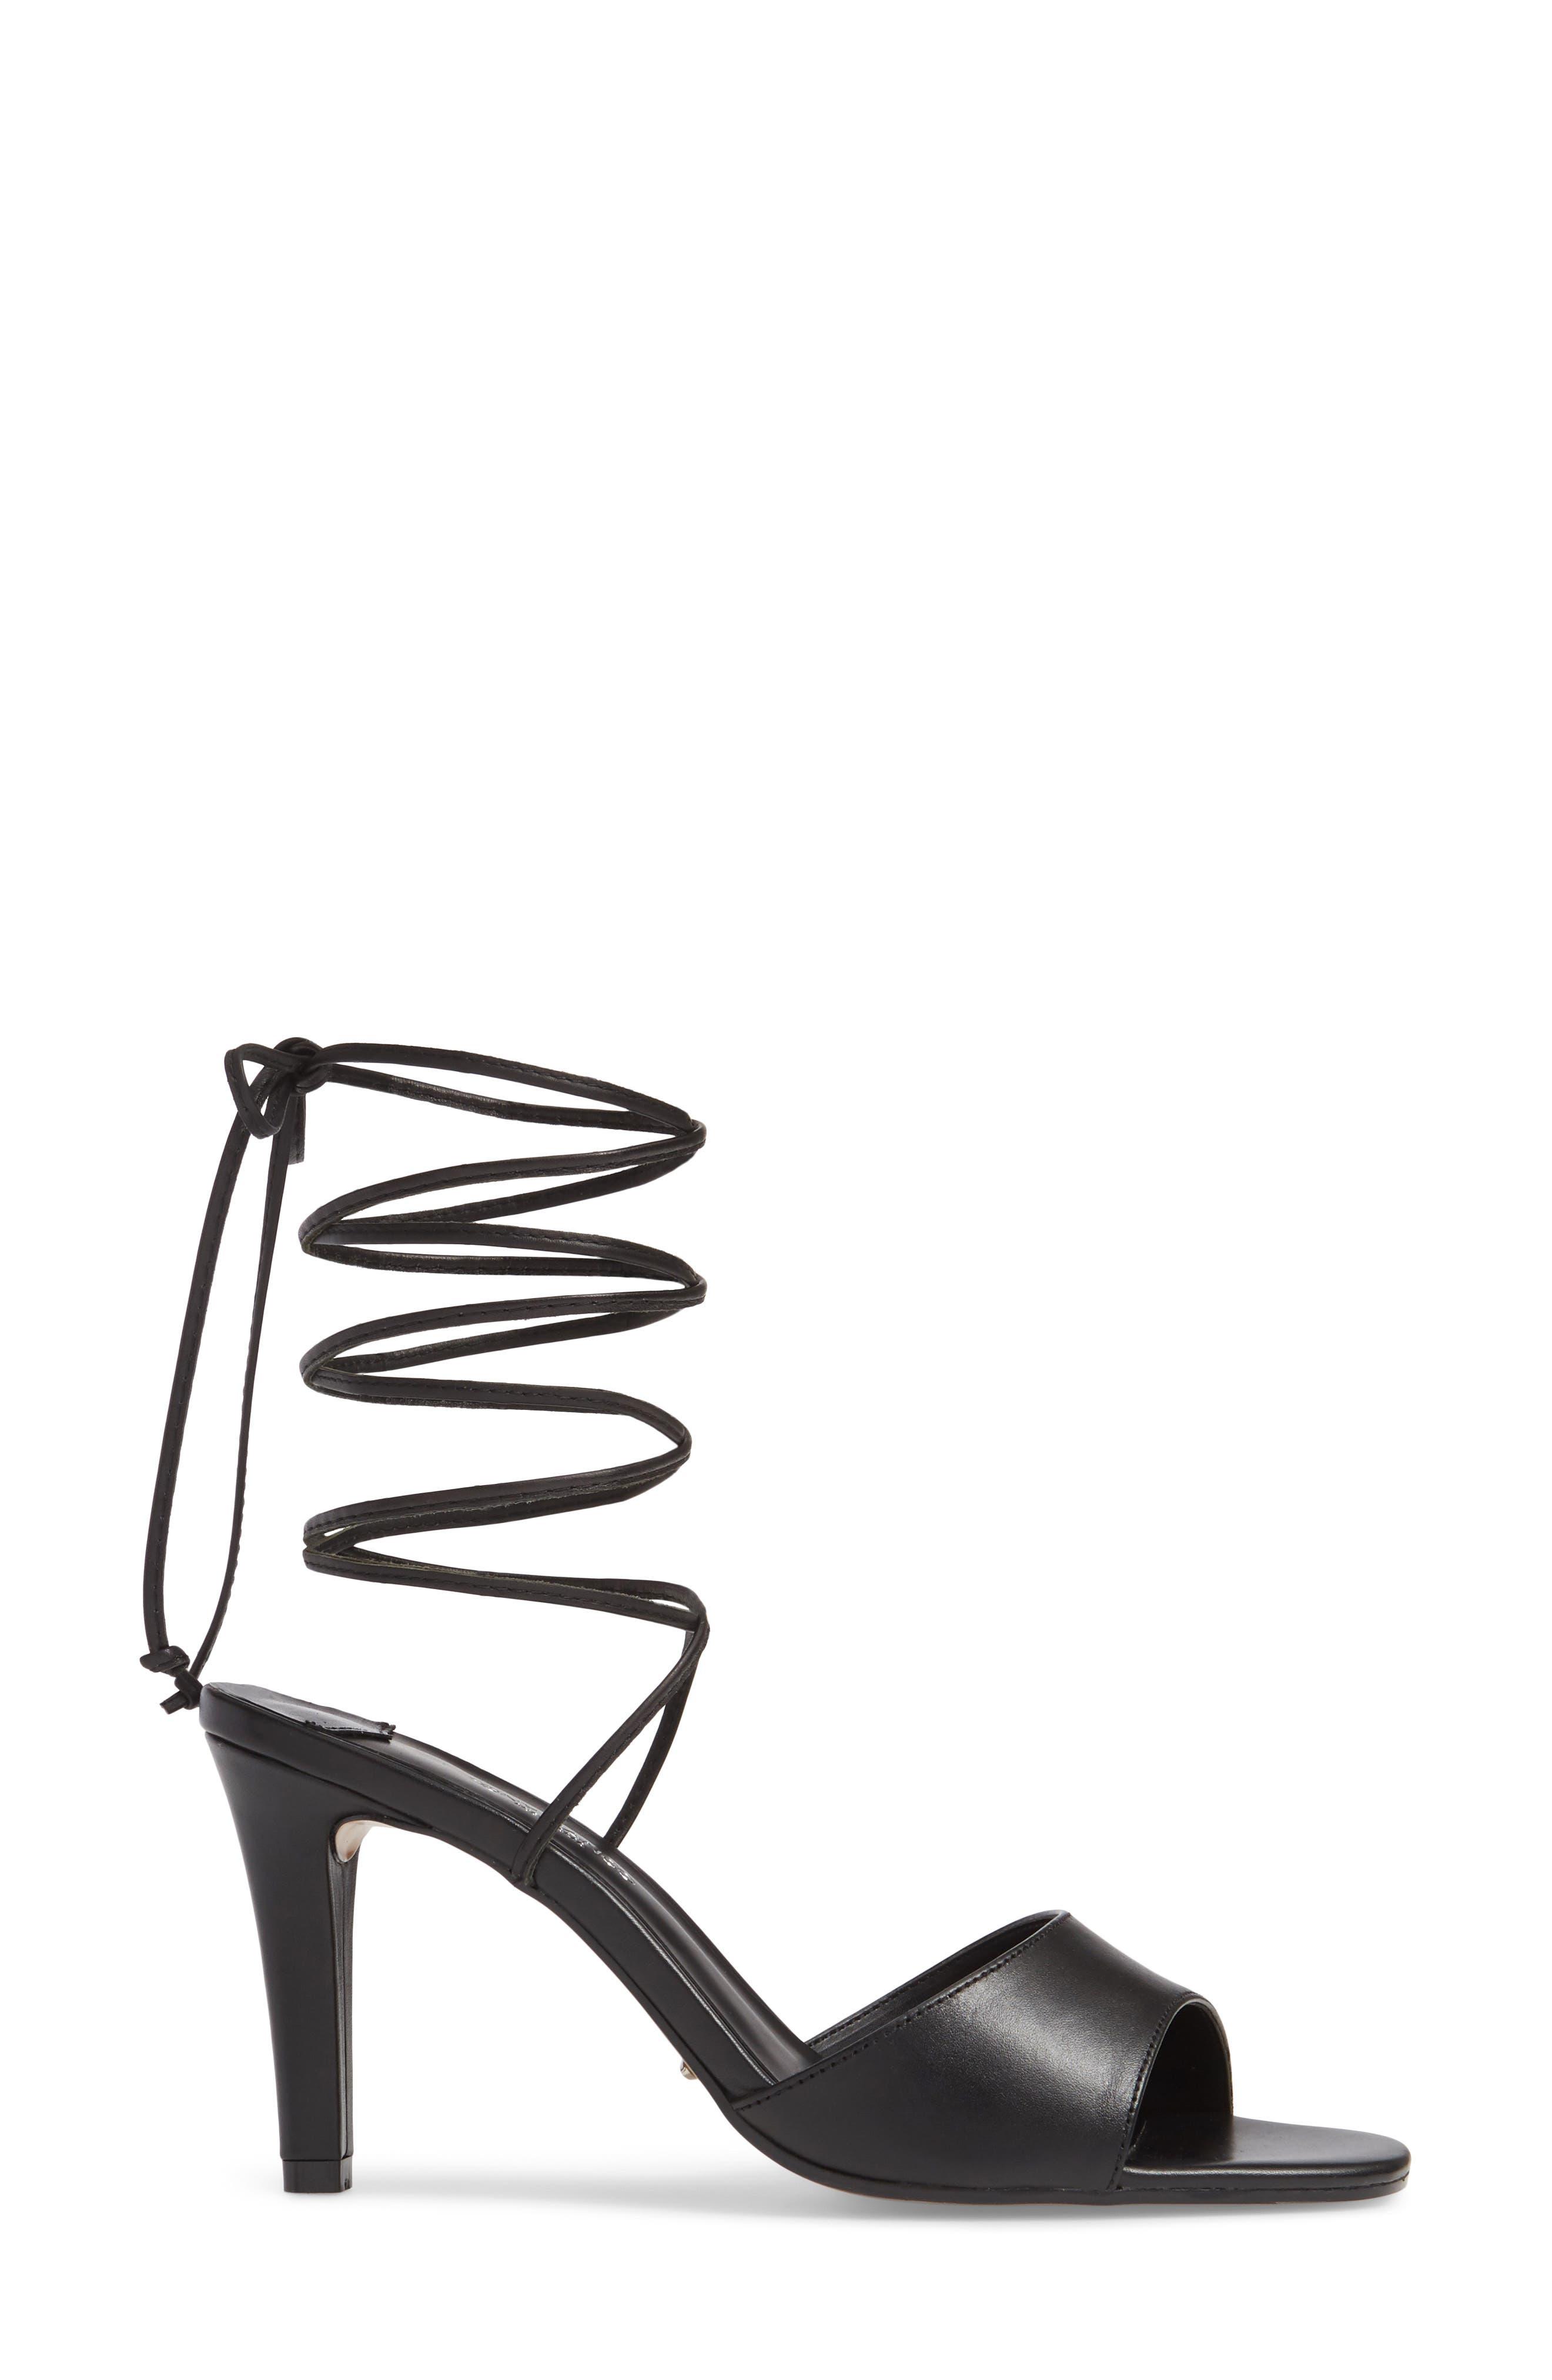 Ruffian Wraparound Sandal,                             Alternate thumbnail 3, color,                             BLACK COMO